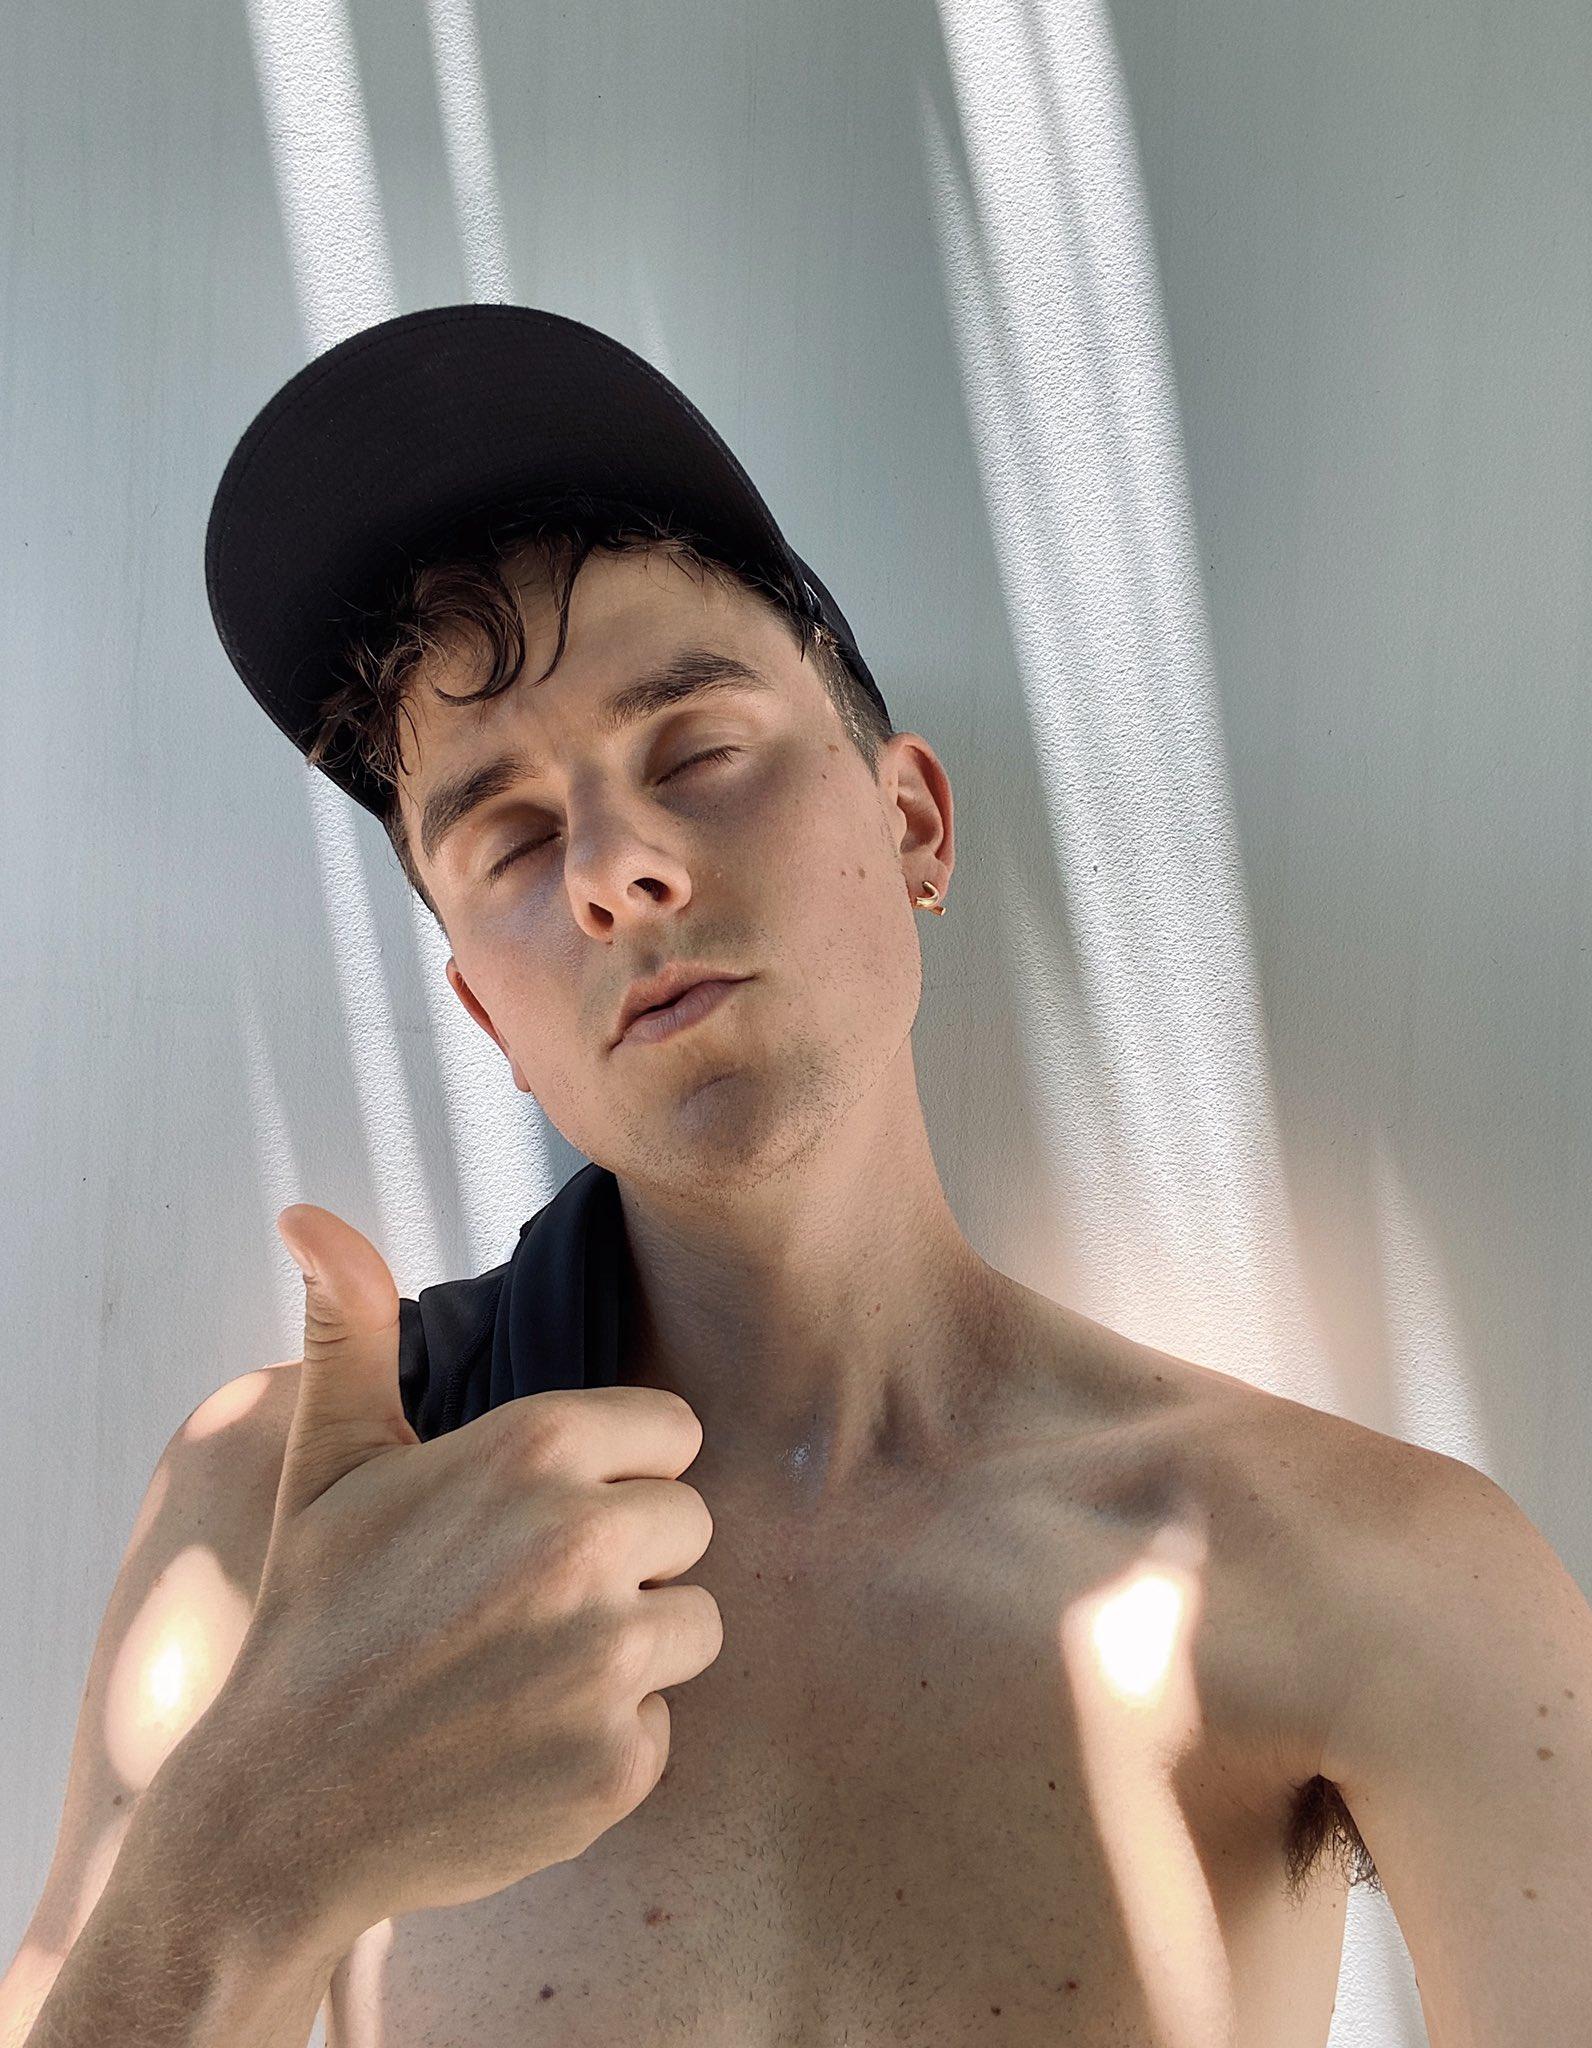 General photo of Connor Franta